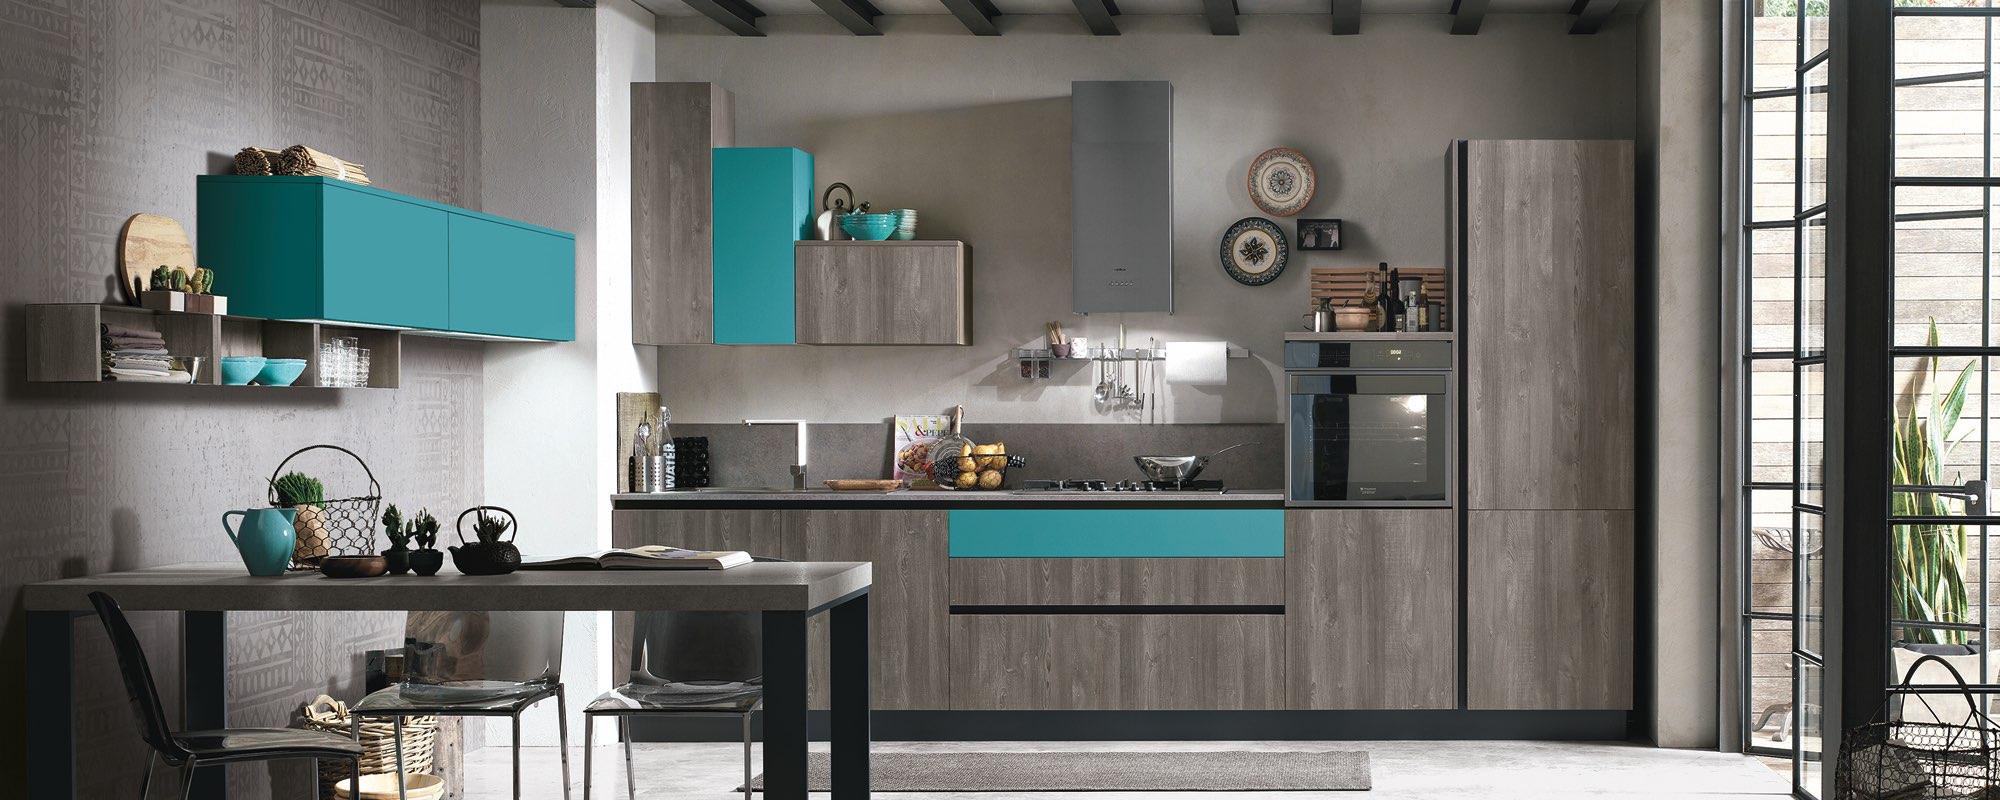 A scandiano cucine salotti camere ed arredamento per - Colori pareti cucina classica ...